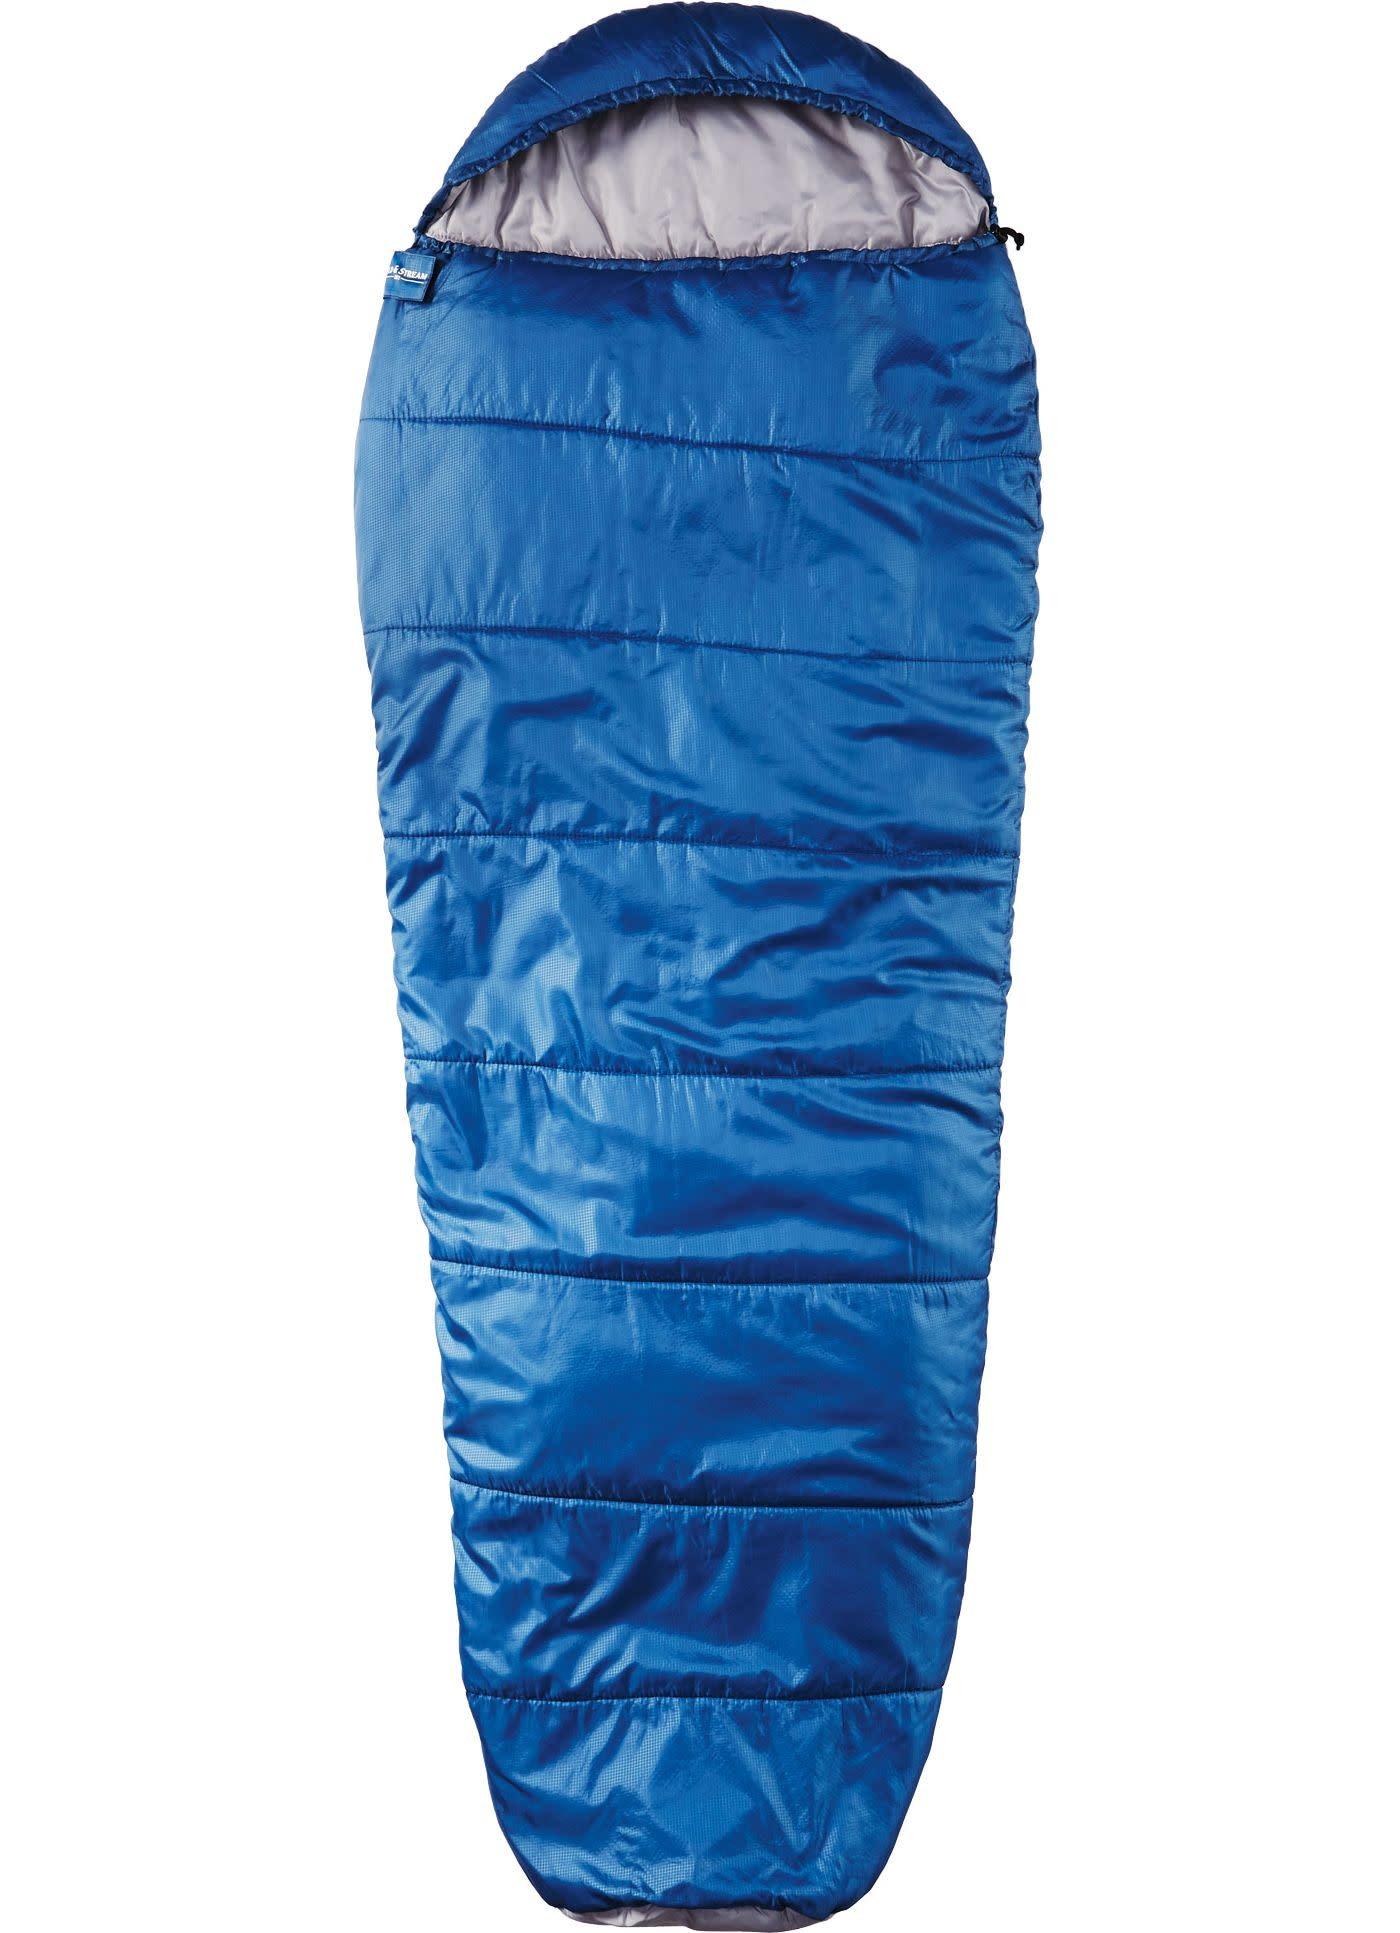 Field & Stream Field & Stream Sportsman Mummy Bag |30deg|Reg